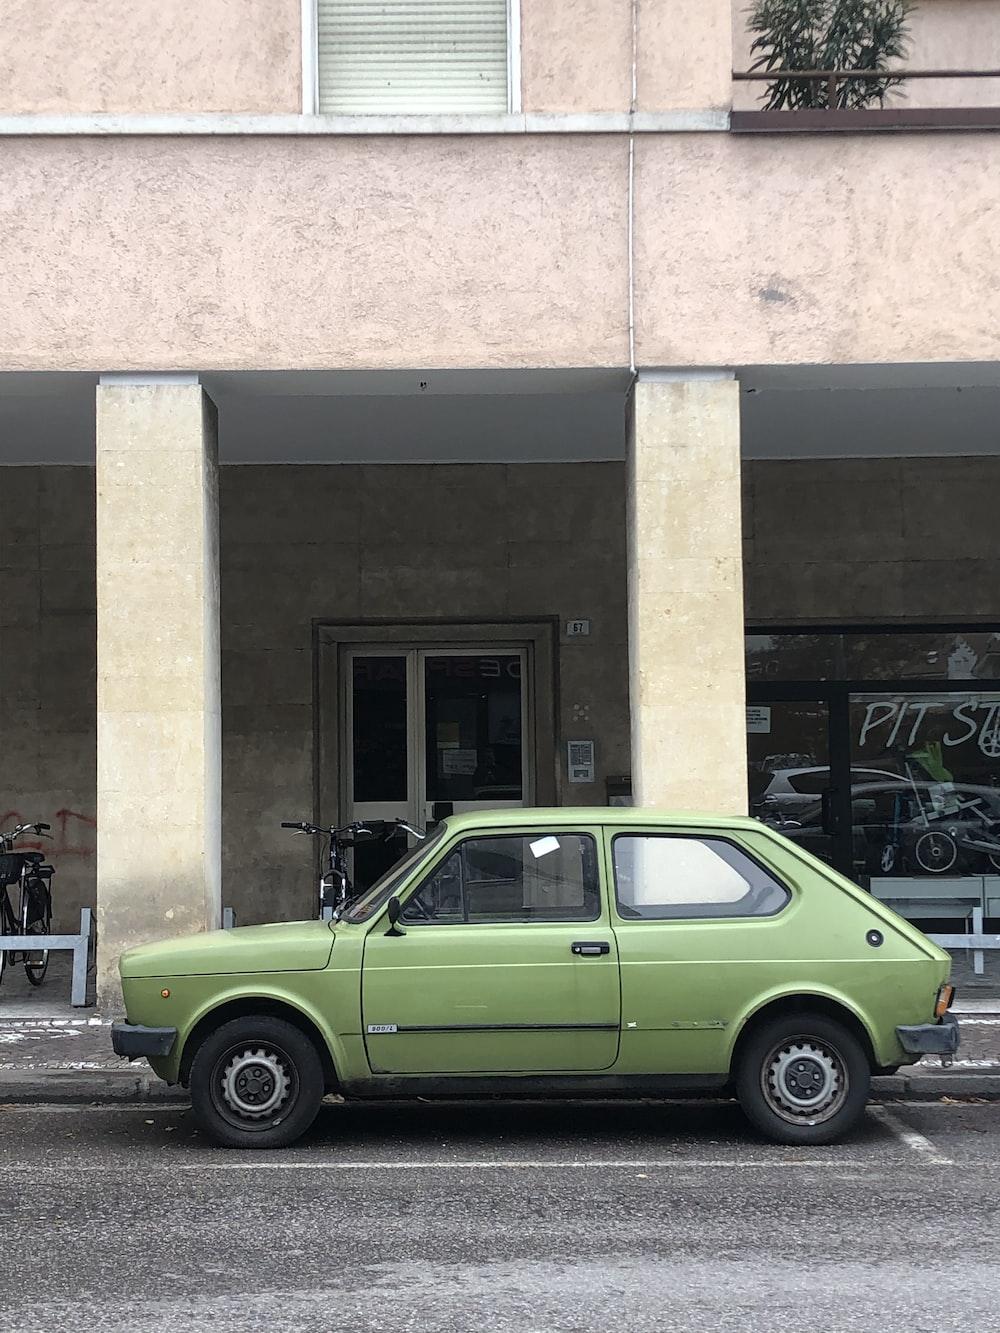 green vehicle near white house